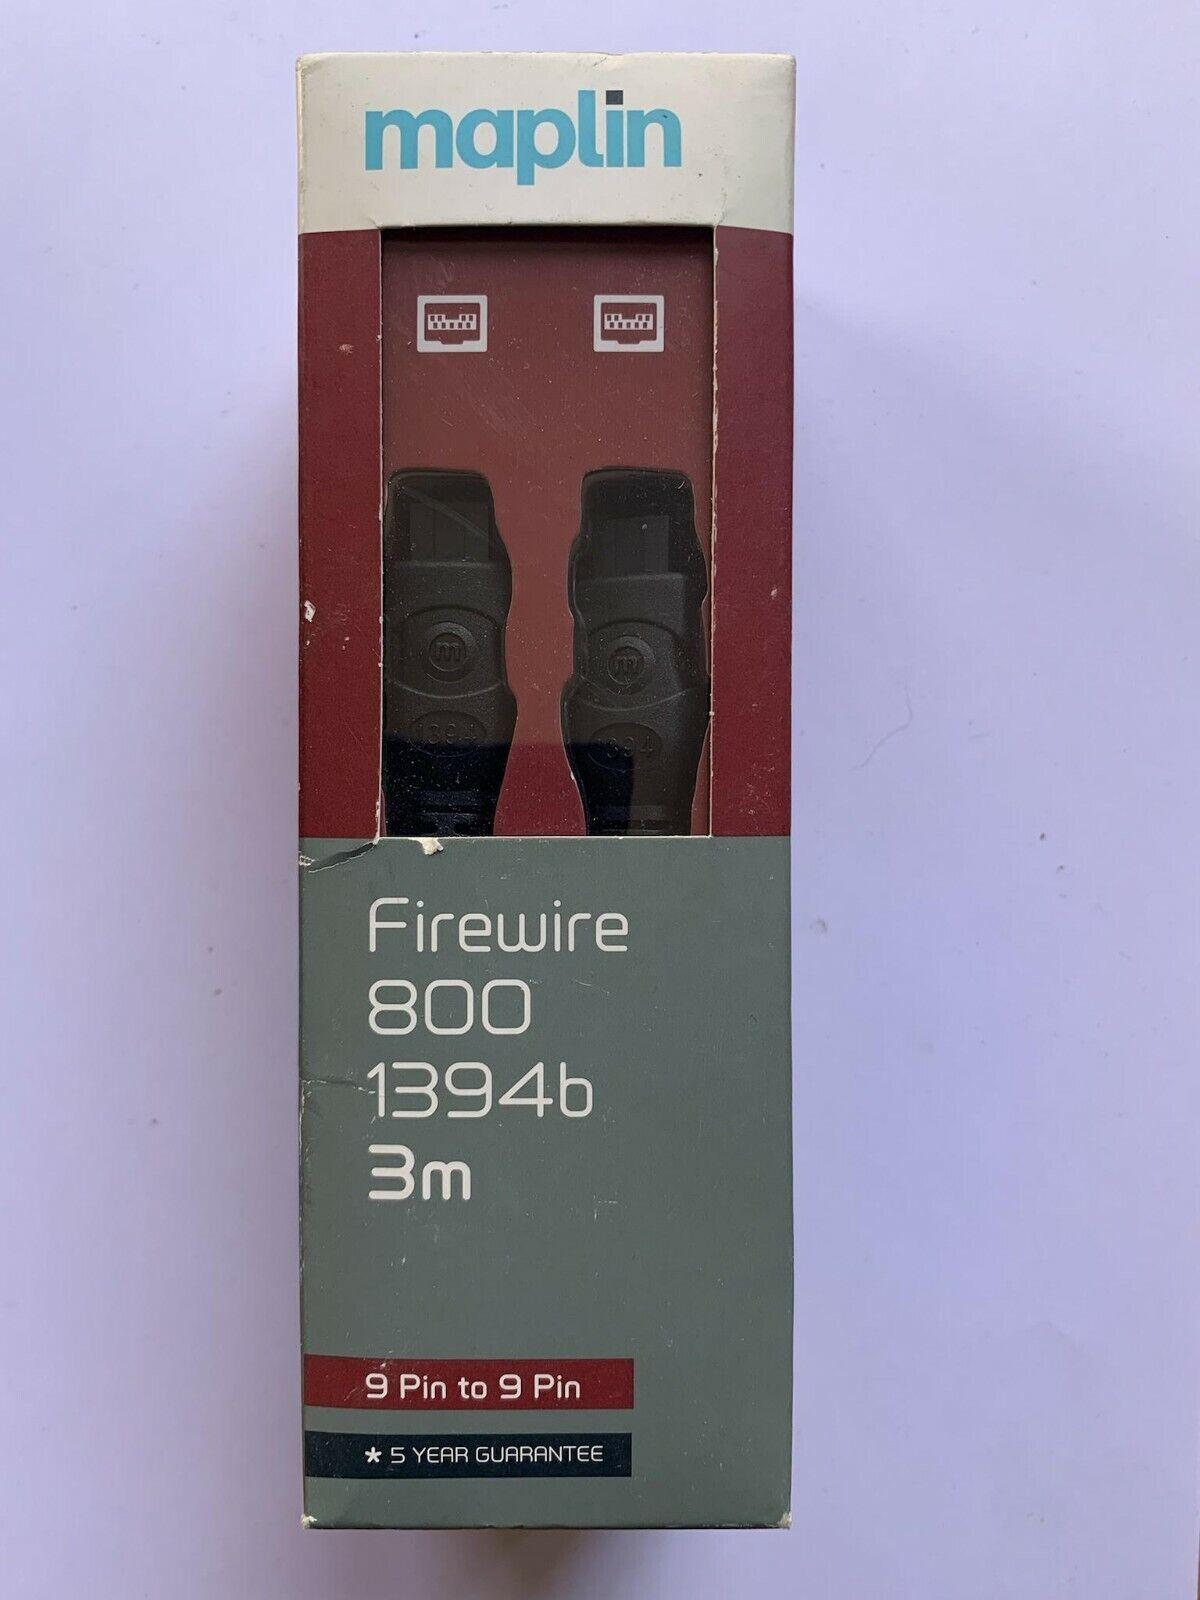 Firewire 800 1394b 9 PIN to 9 PIN 3m